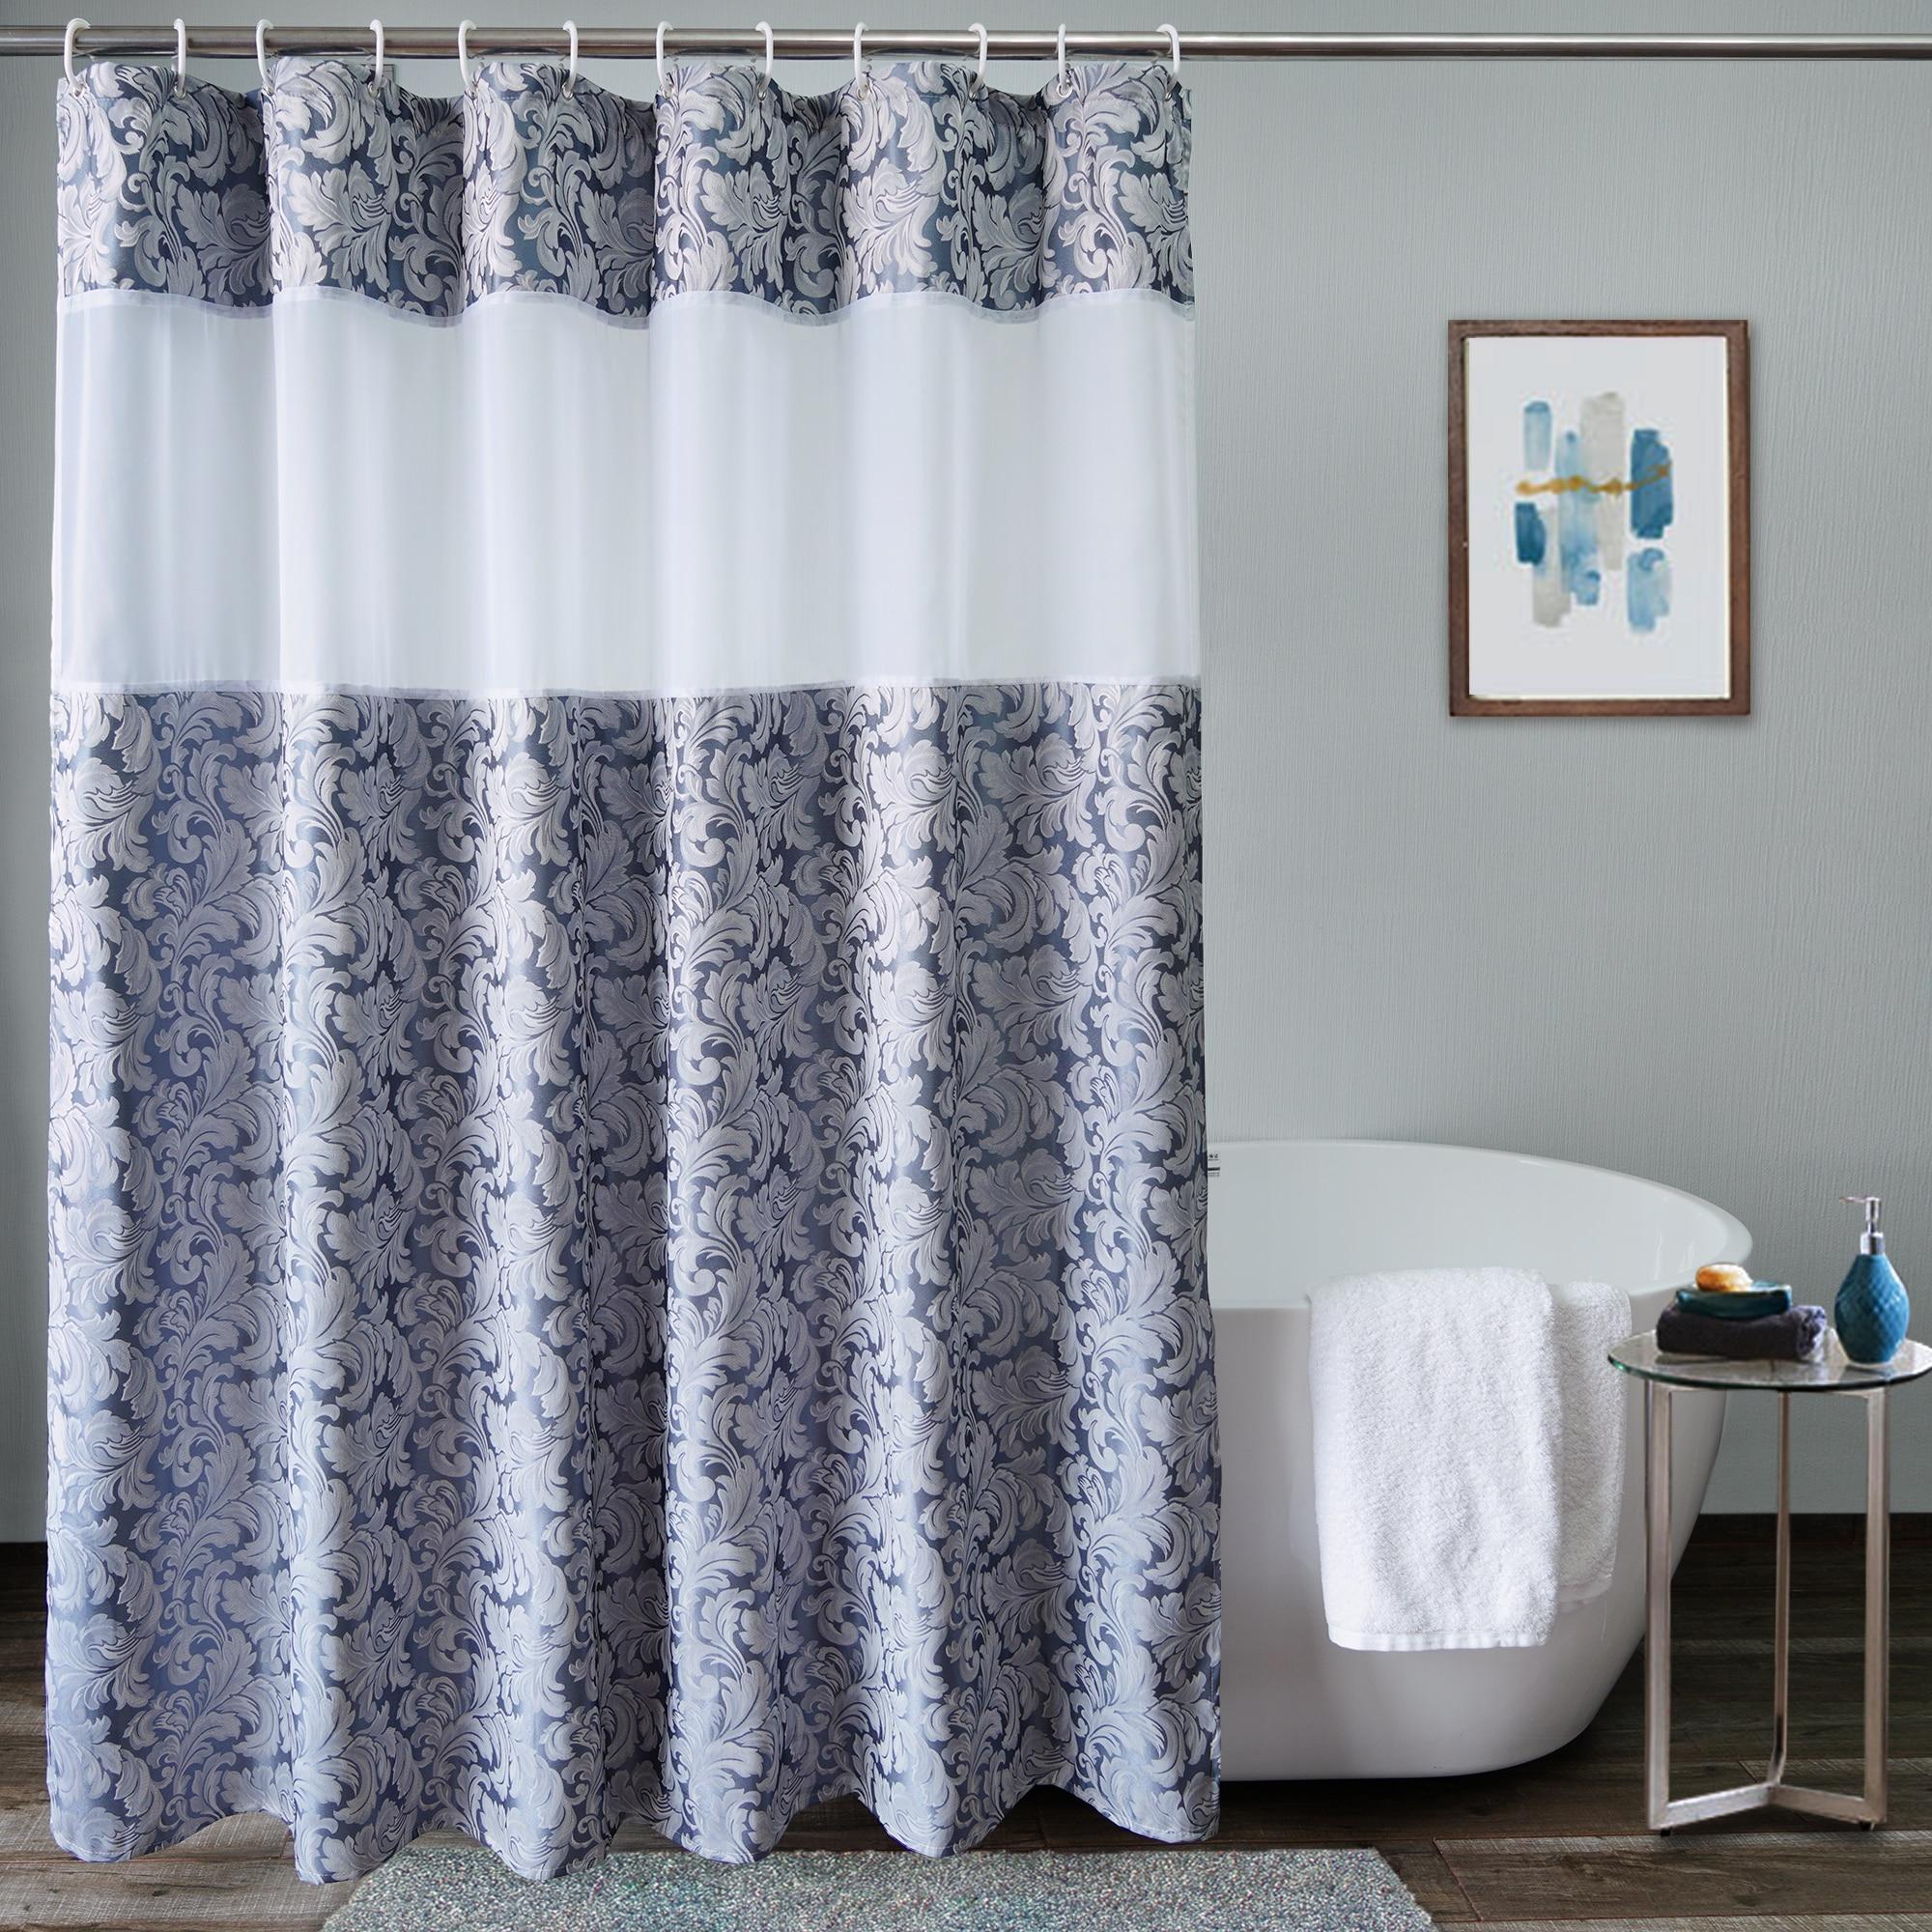 ufriday elegant shower curtain white gauze polyester fabric waterproof bathroom curtain thick jacquard silver grey bath curtains